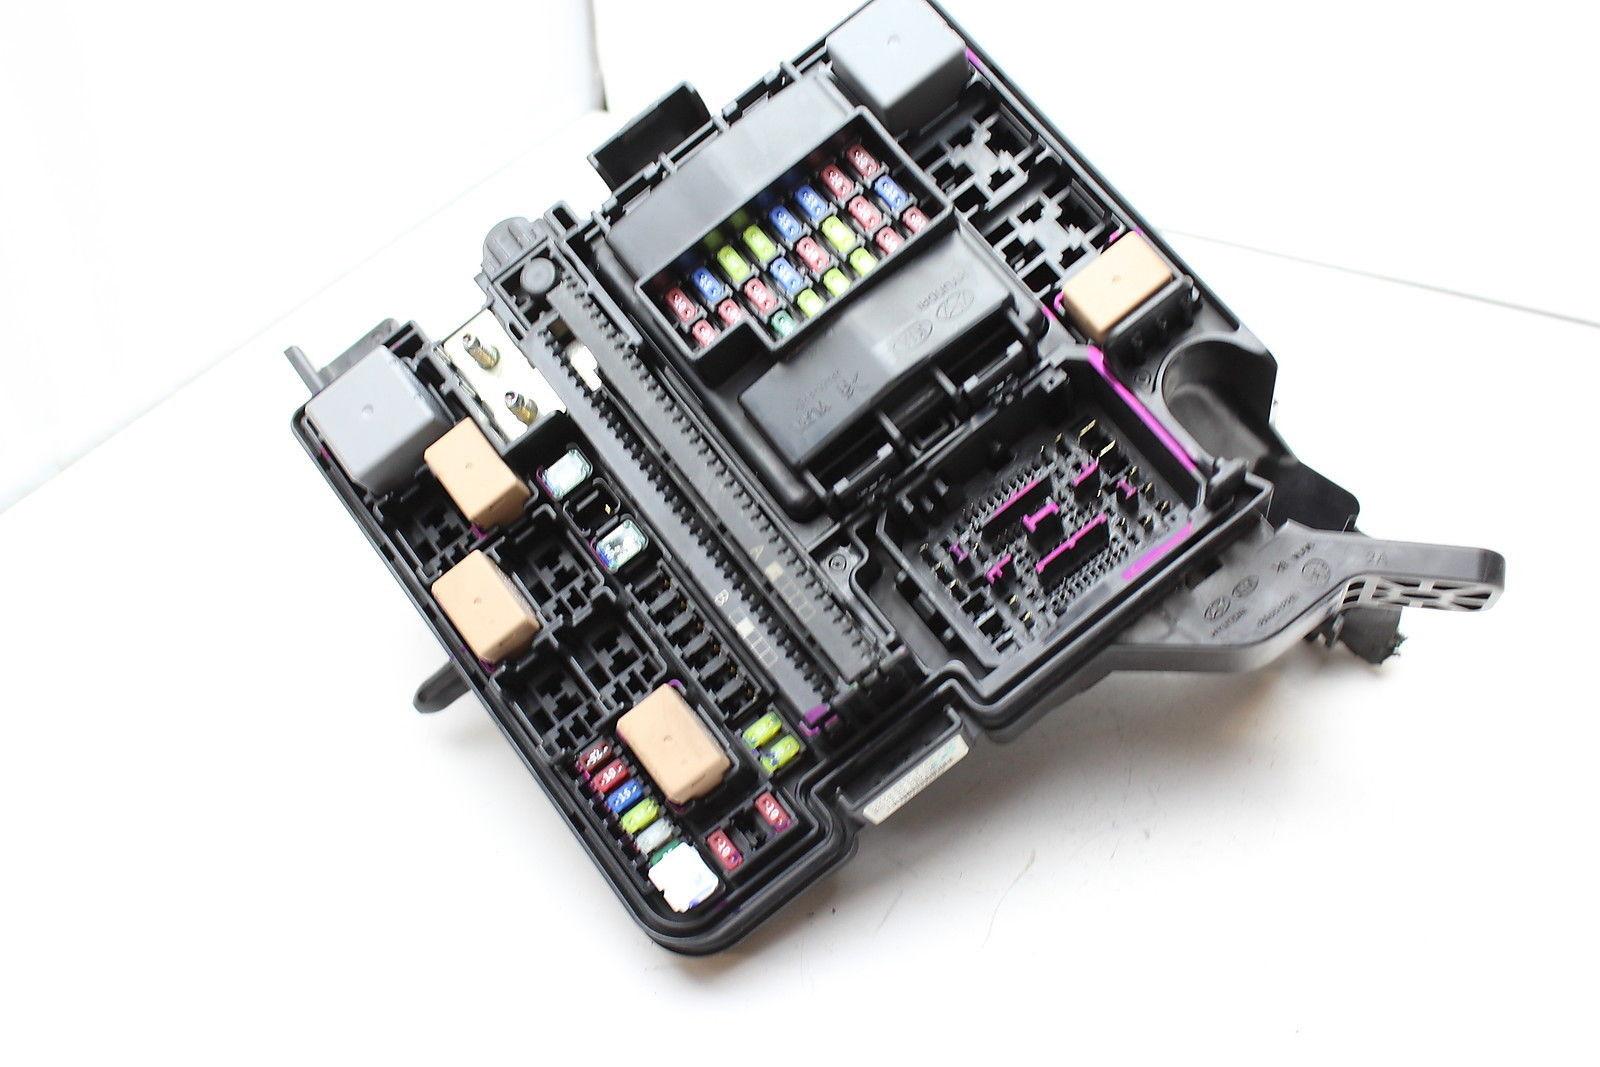 Hyundai Relay 2010s 63 Listings Sonata Dash Fuse Box 15 2015 91200 C2010 Fusebox Unit Module L99 11995